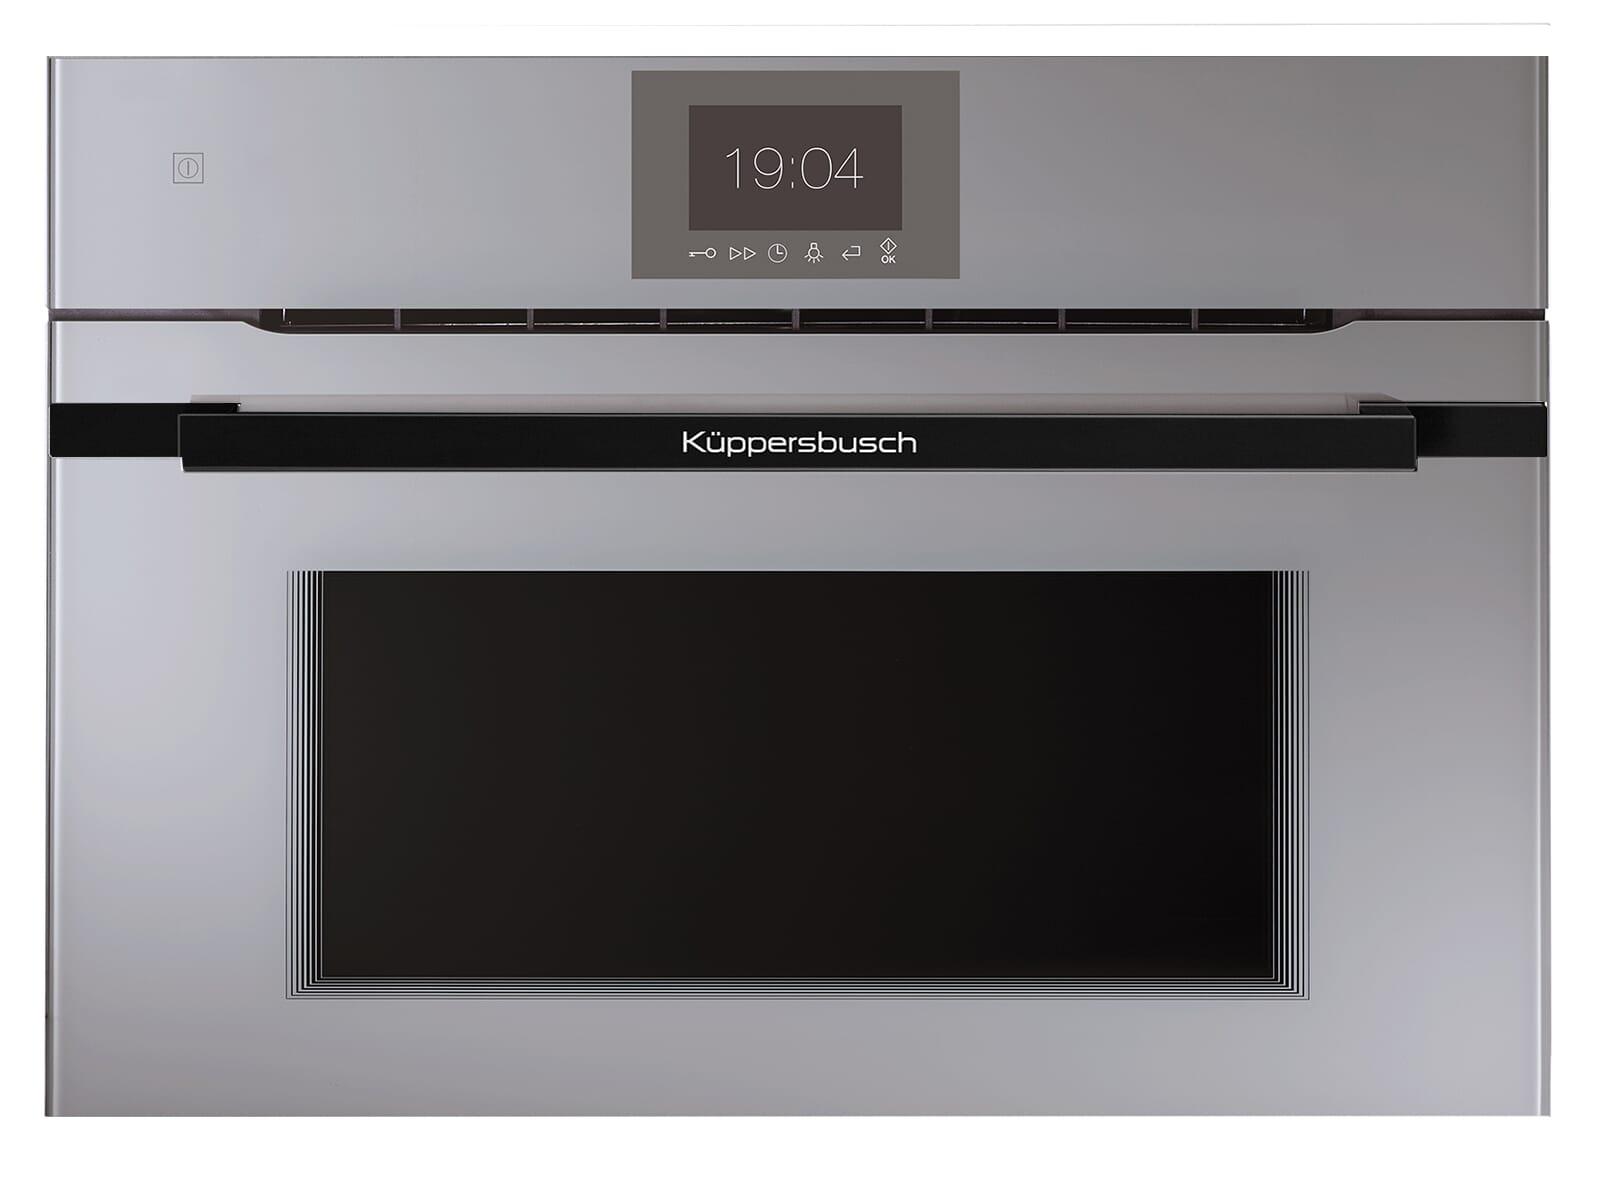 Küppersbusch CBM 6550.0 GE5 K-Series. 5 Compact Backofen mit Mikrowelle Grau/Black Velvet